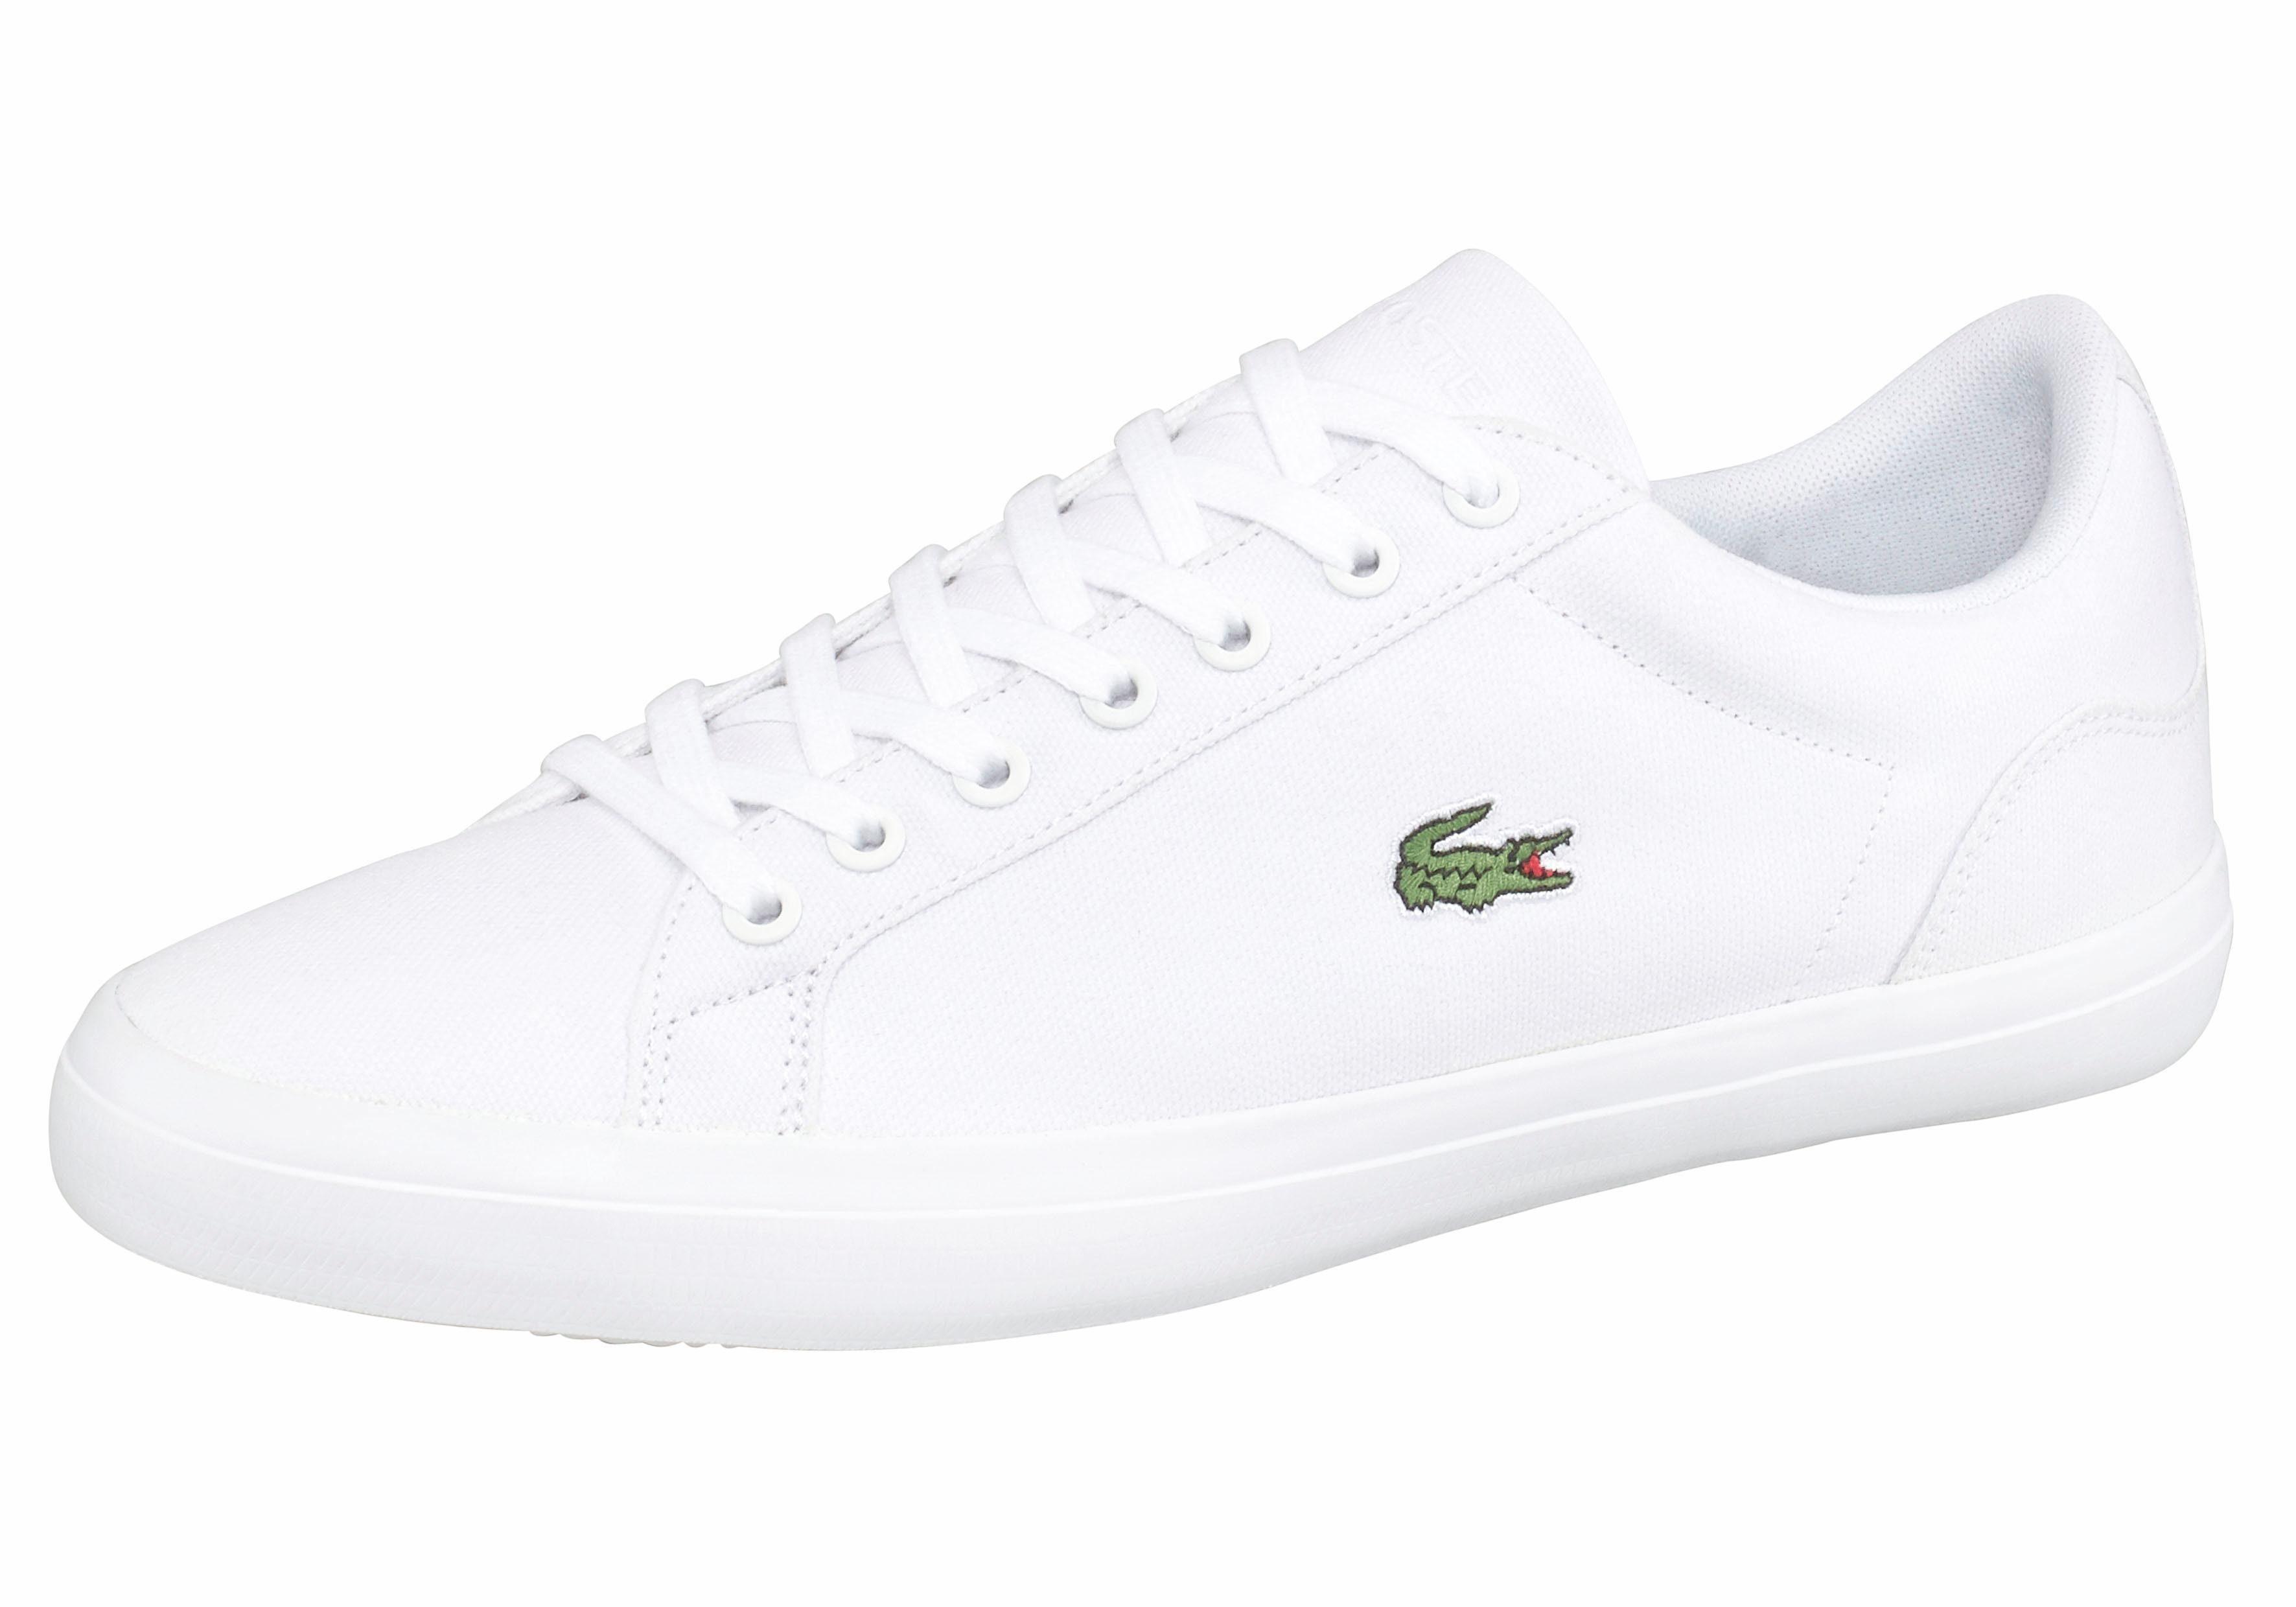 Afbeeldingsbron: LACOSTE sneakers »Lerond BL 2 Cam«